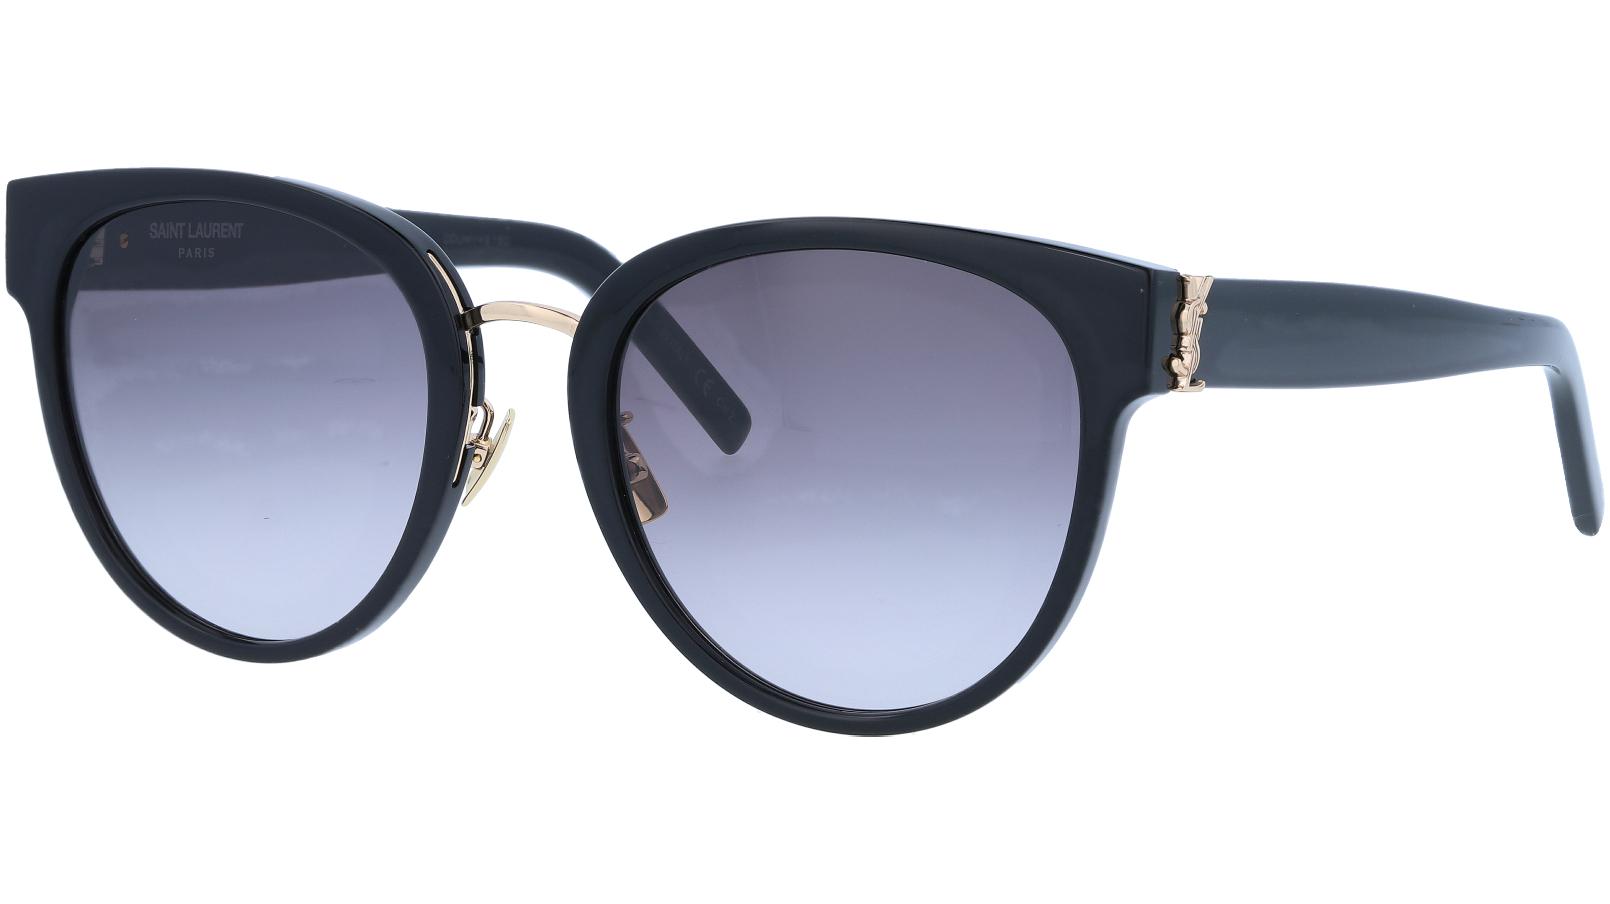 Saint Laurent SLM38K 002 55 Black Sunglasses